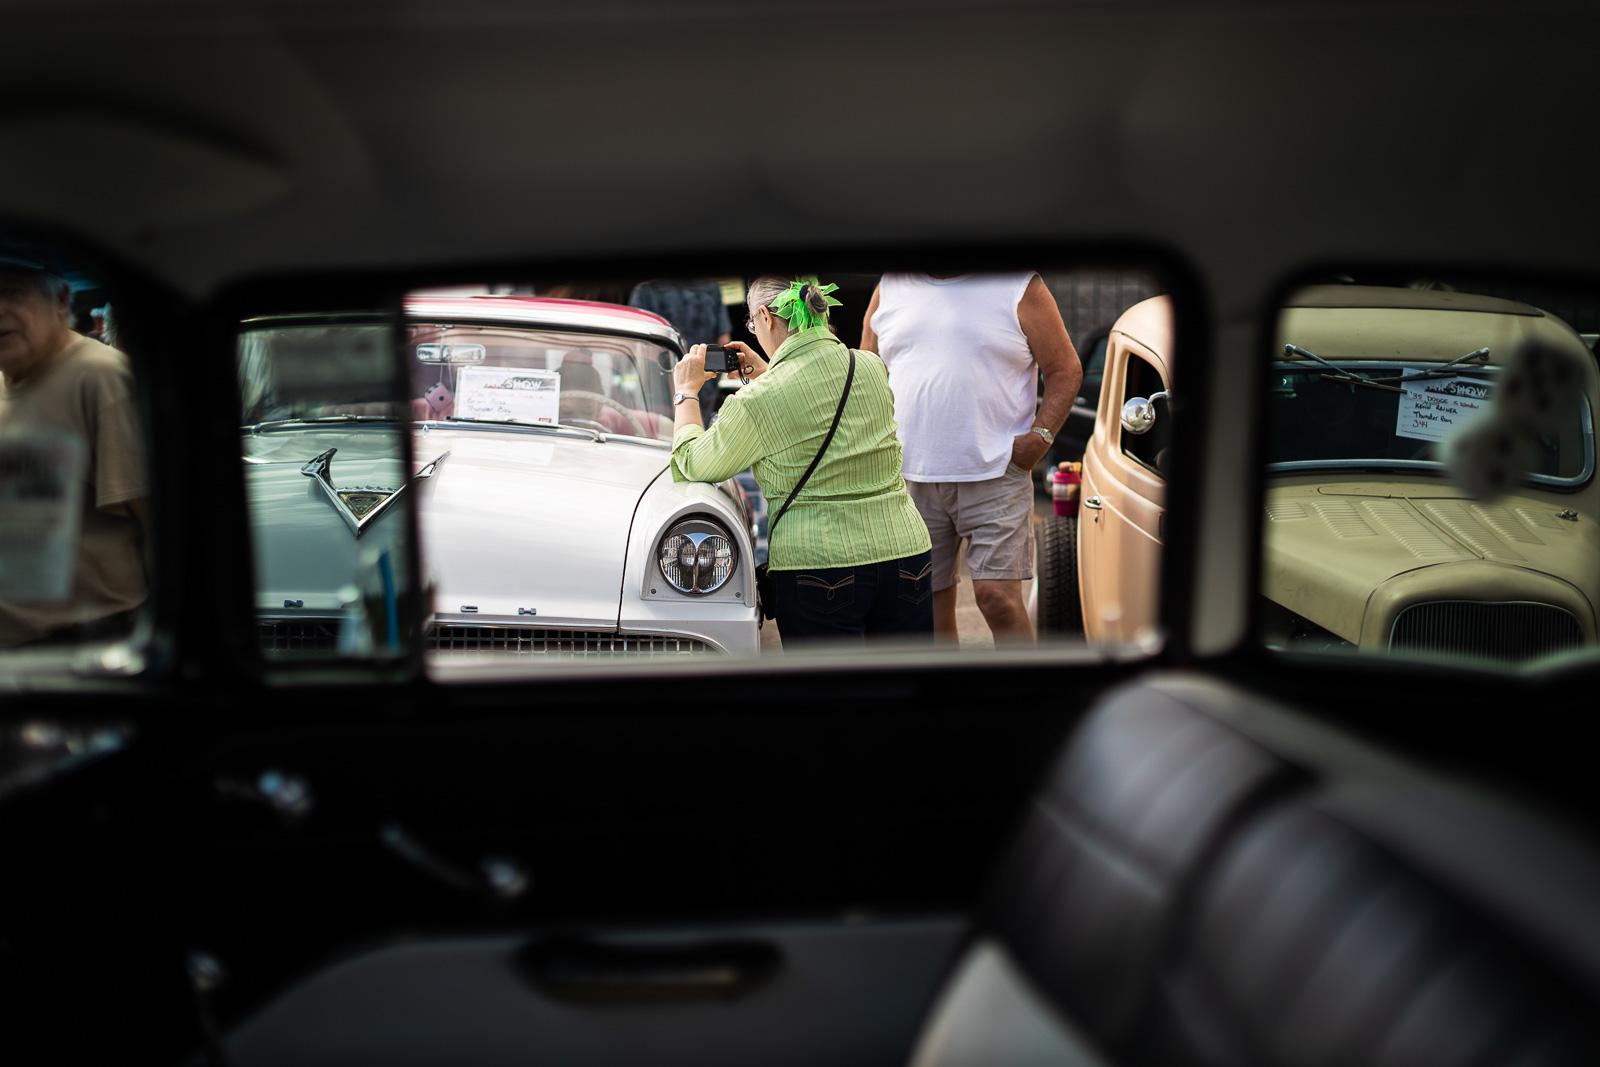 fat-guys-car-show-blog-31.jpg